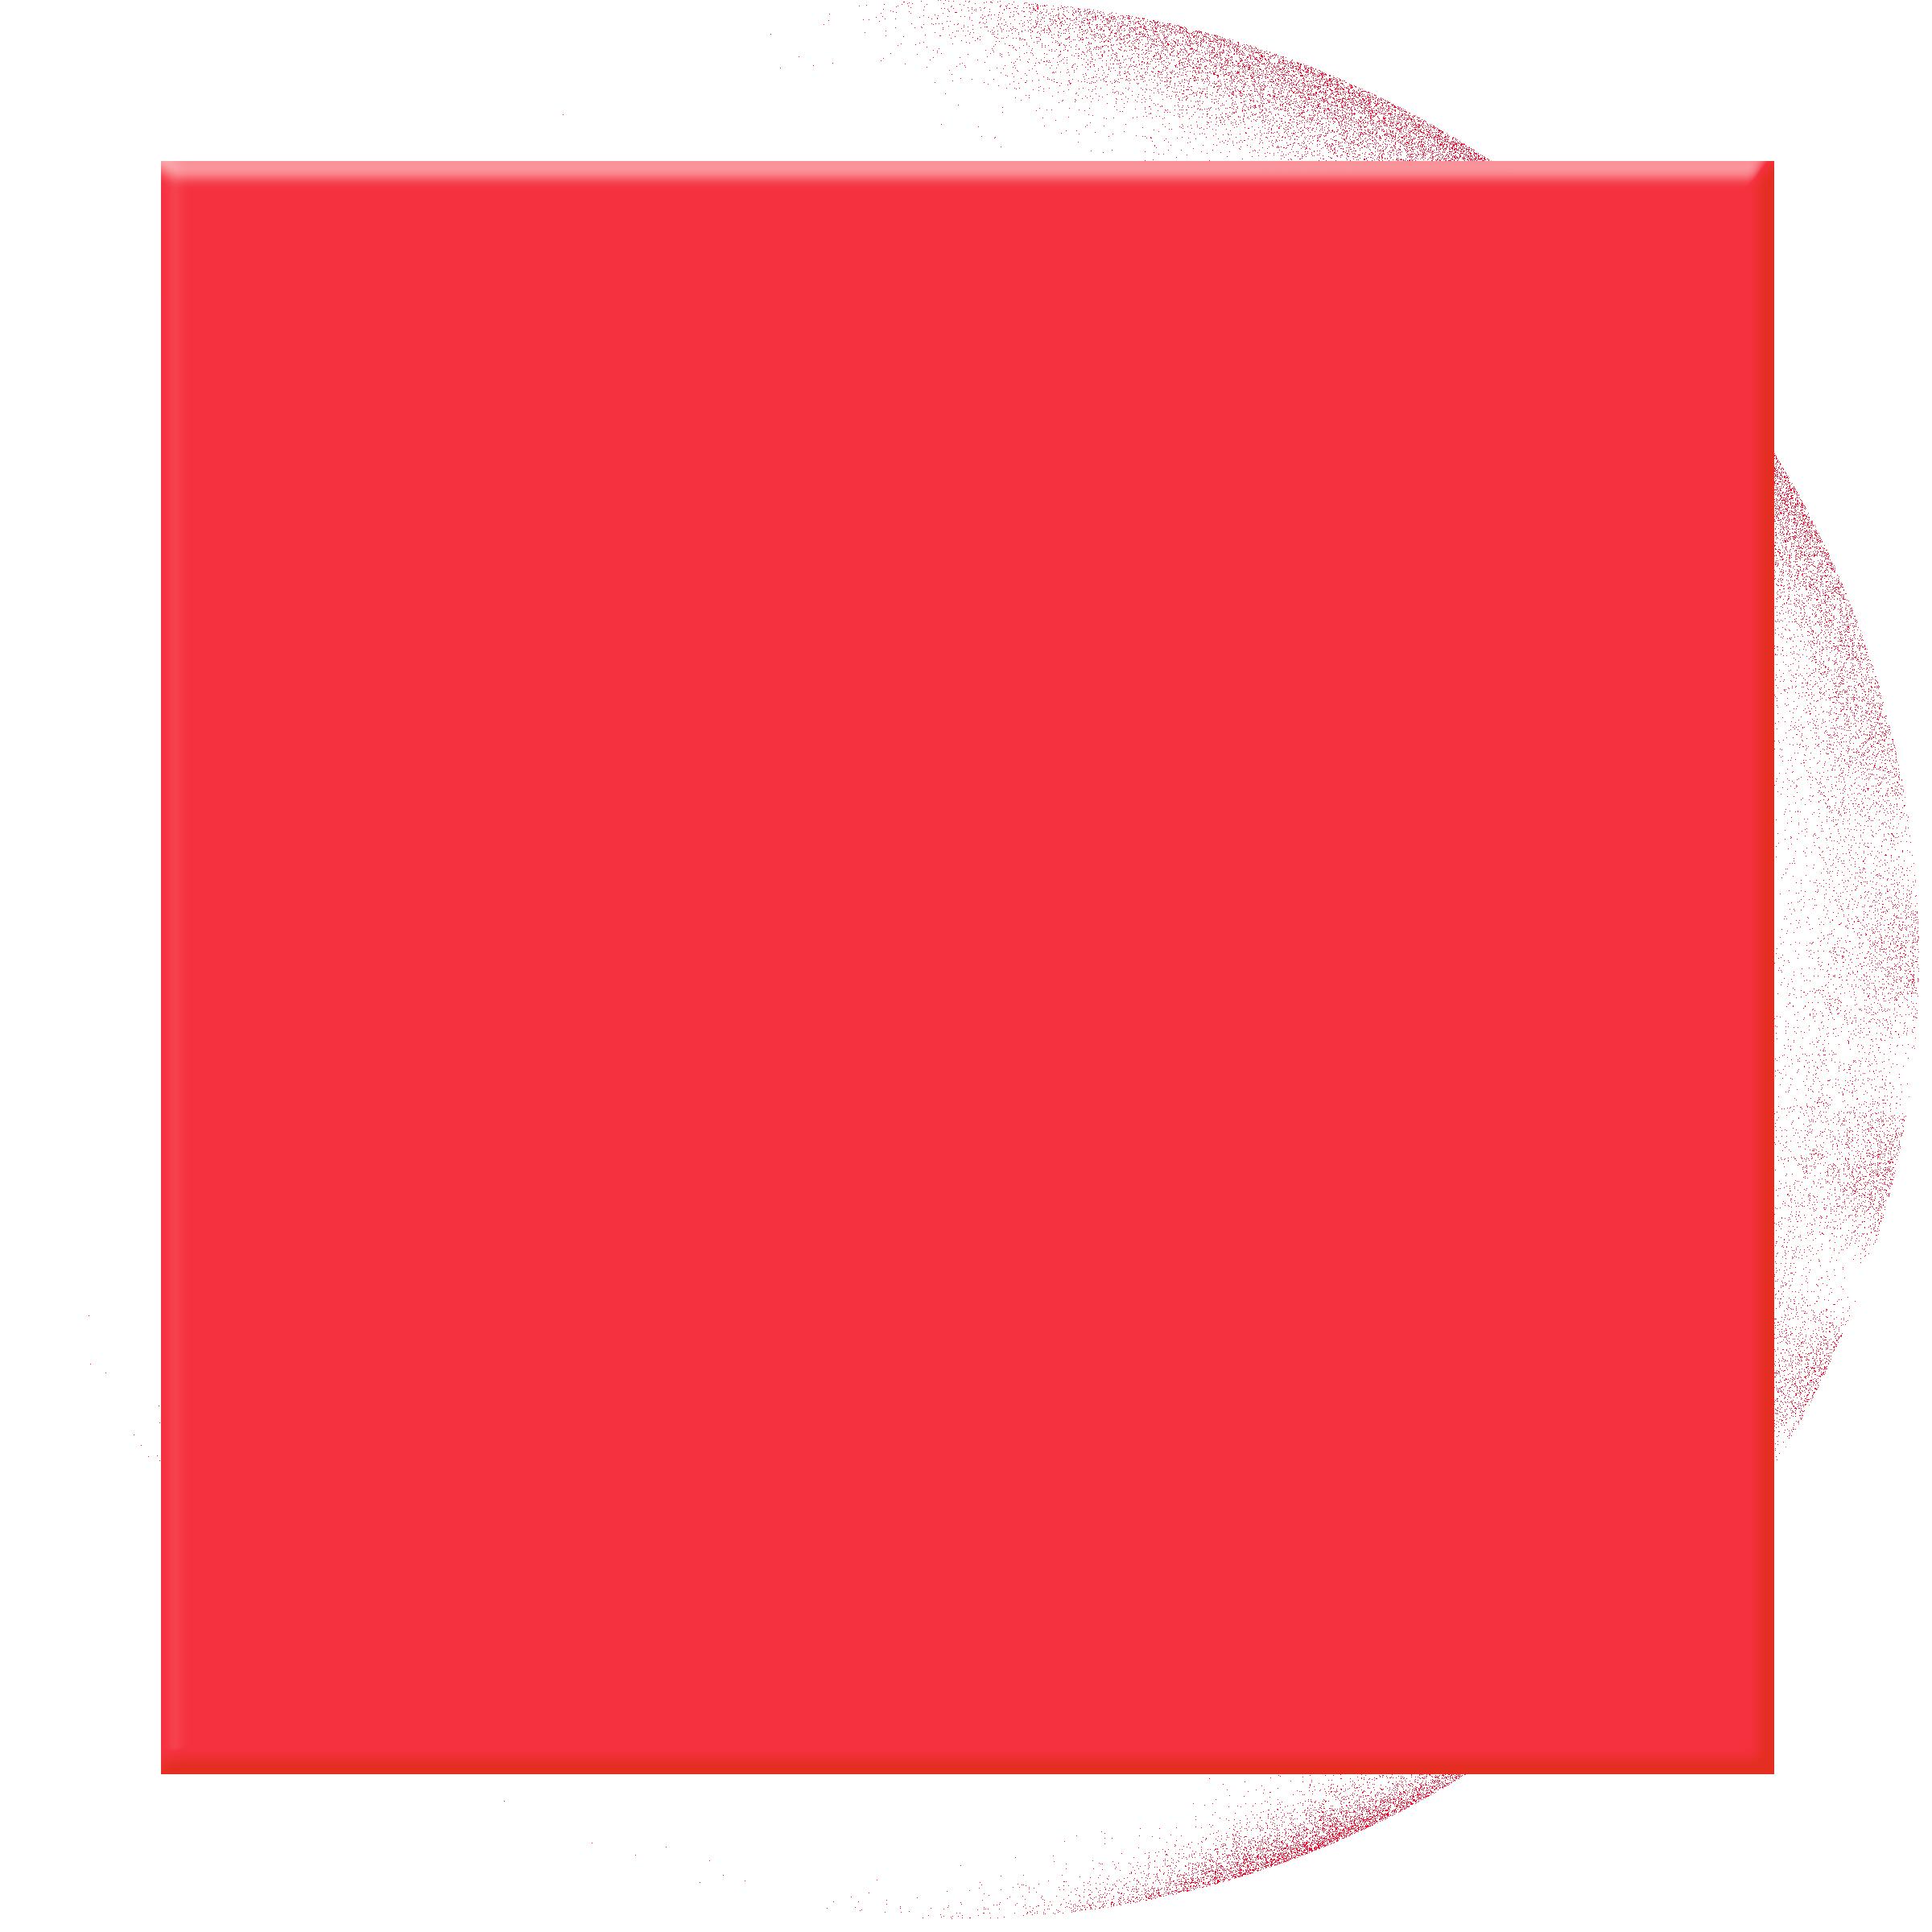 PNG Square Shape - 85282